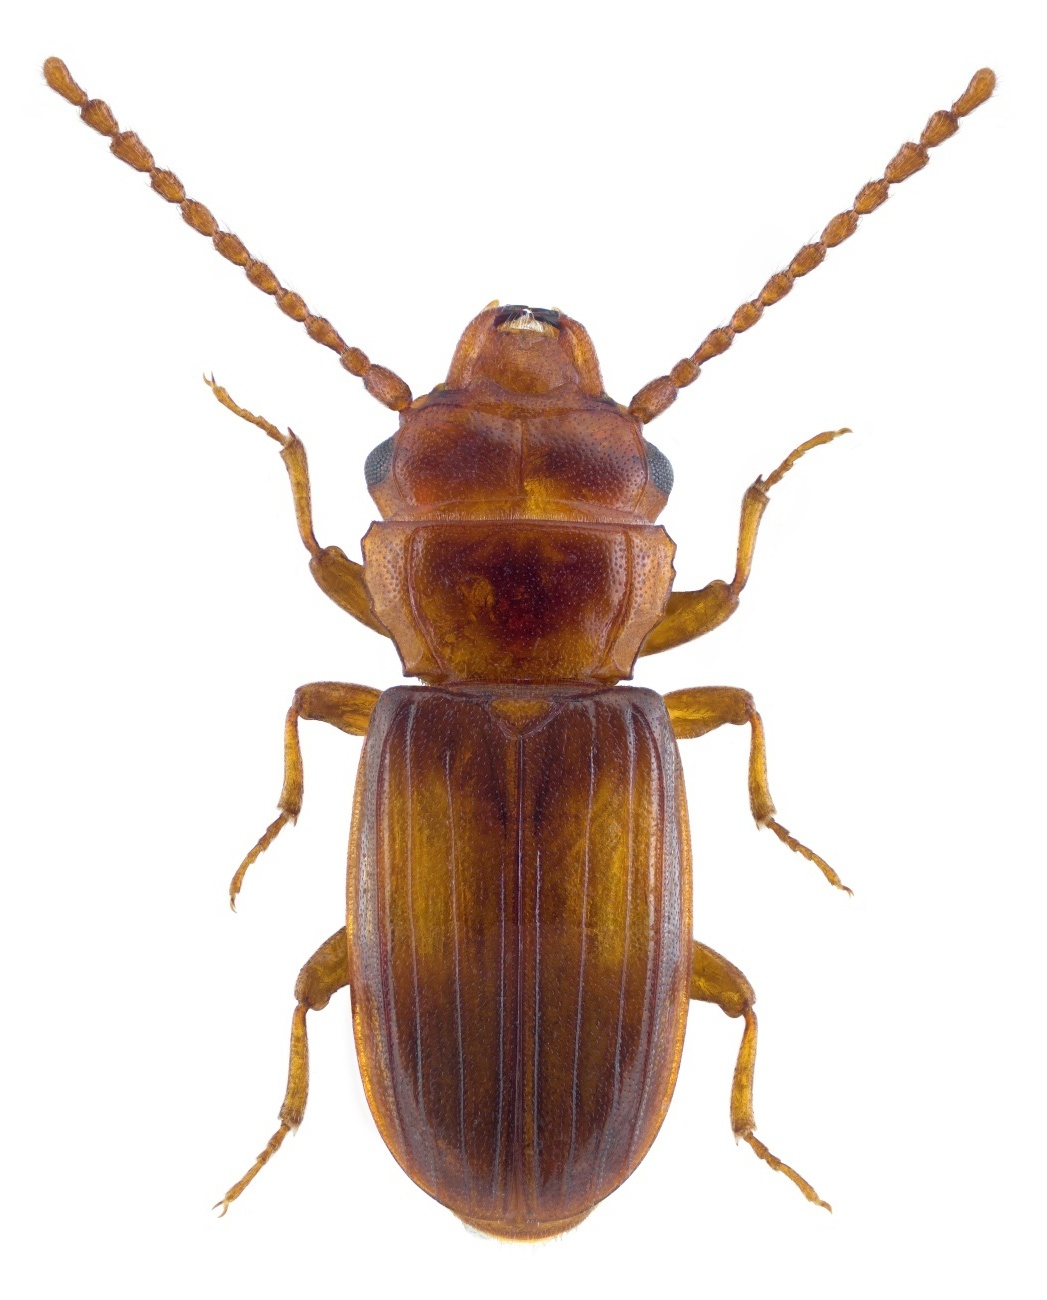 Laemophloeus monilis 2